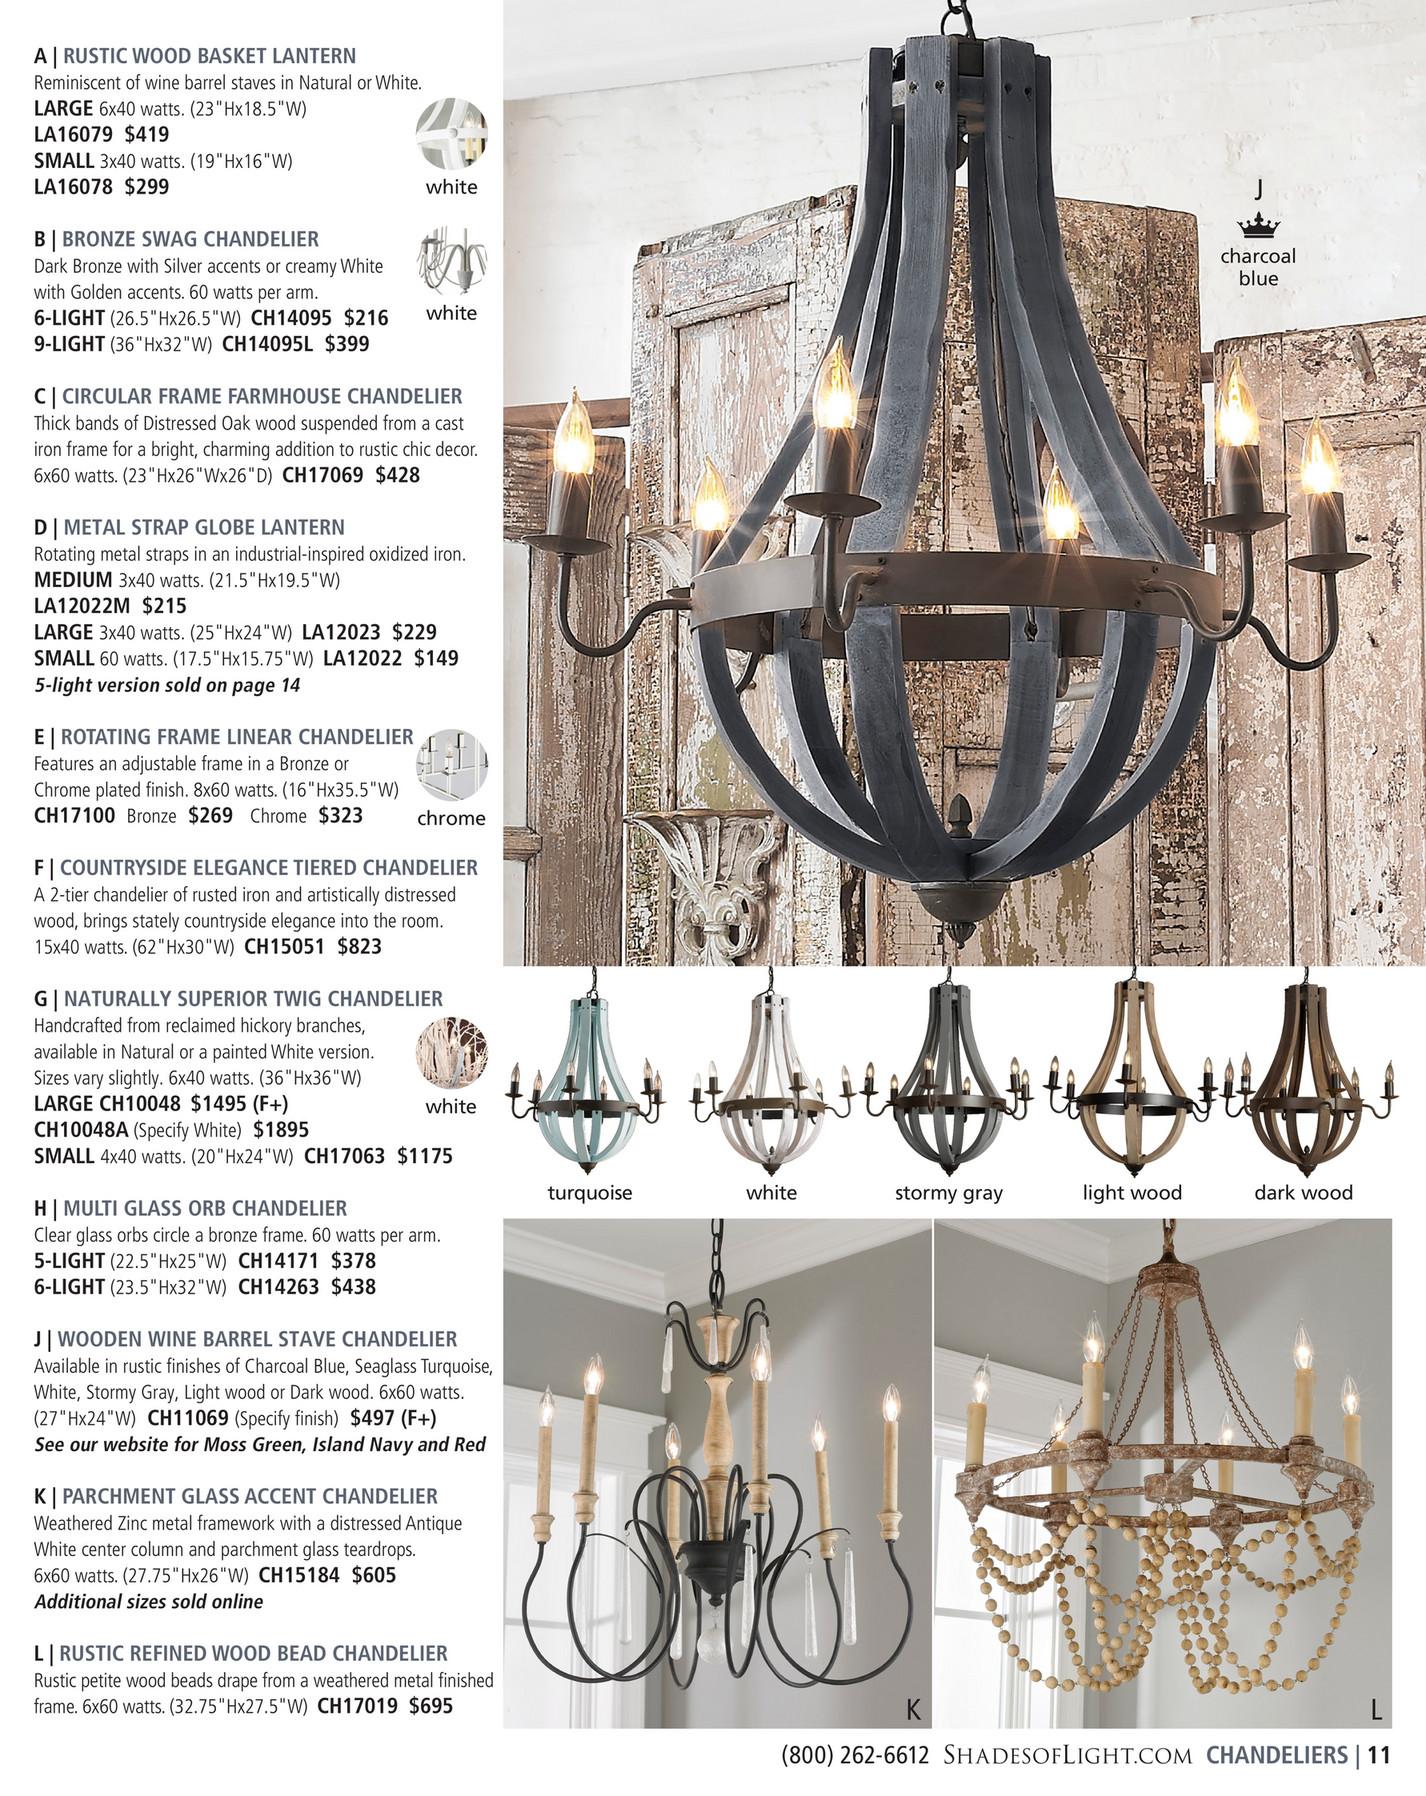 Shades Of Light Modern Farmhouse 2018 Rotating Frame Linear